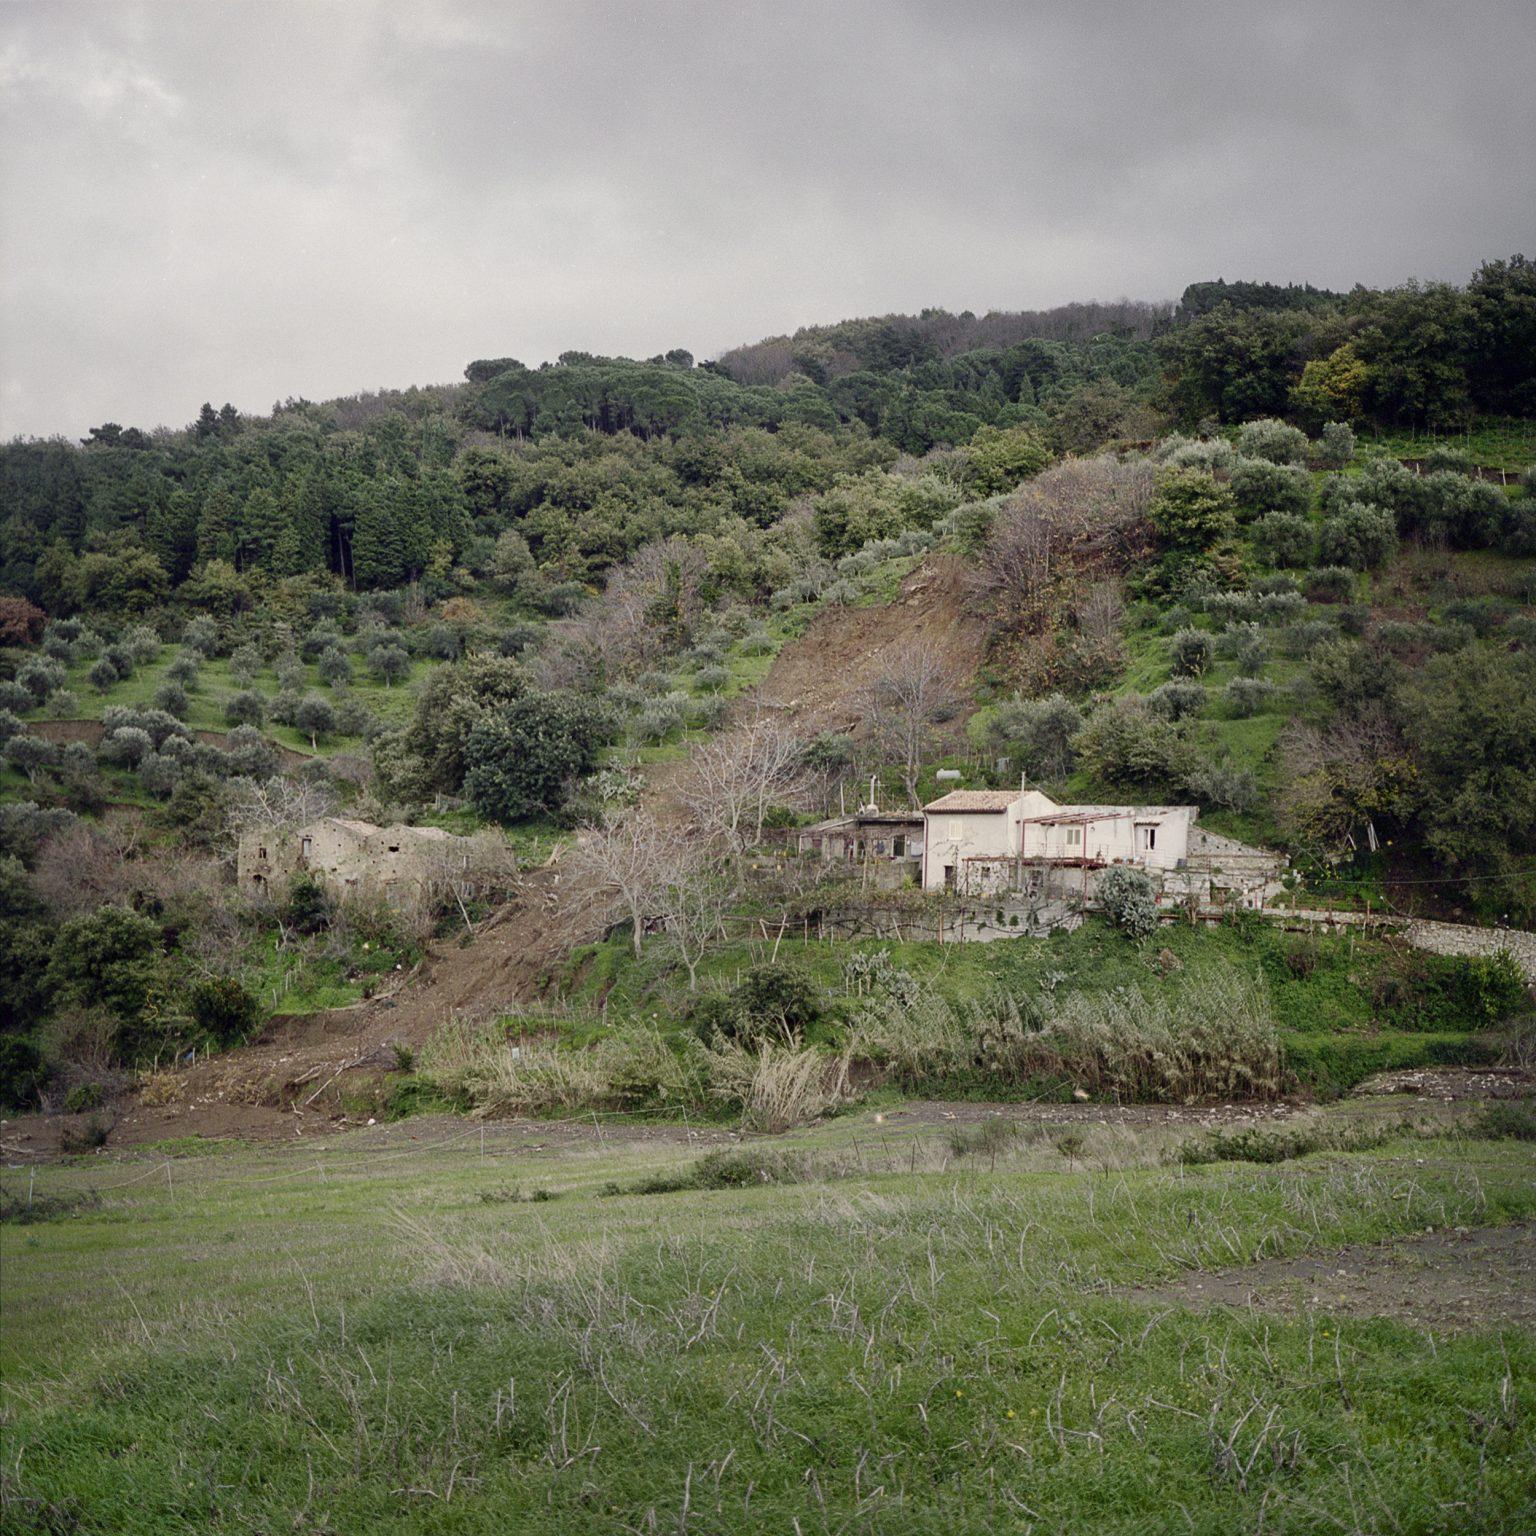 Migliardo, a locality near Barcellona Pozzo di Gotto, December 2011. A landslide near an house of the town.